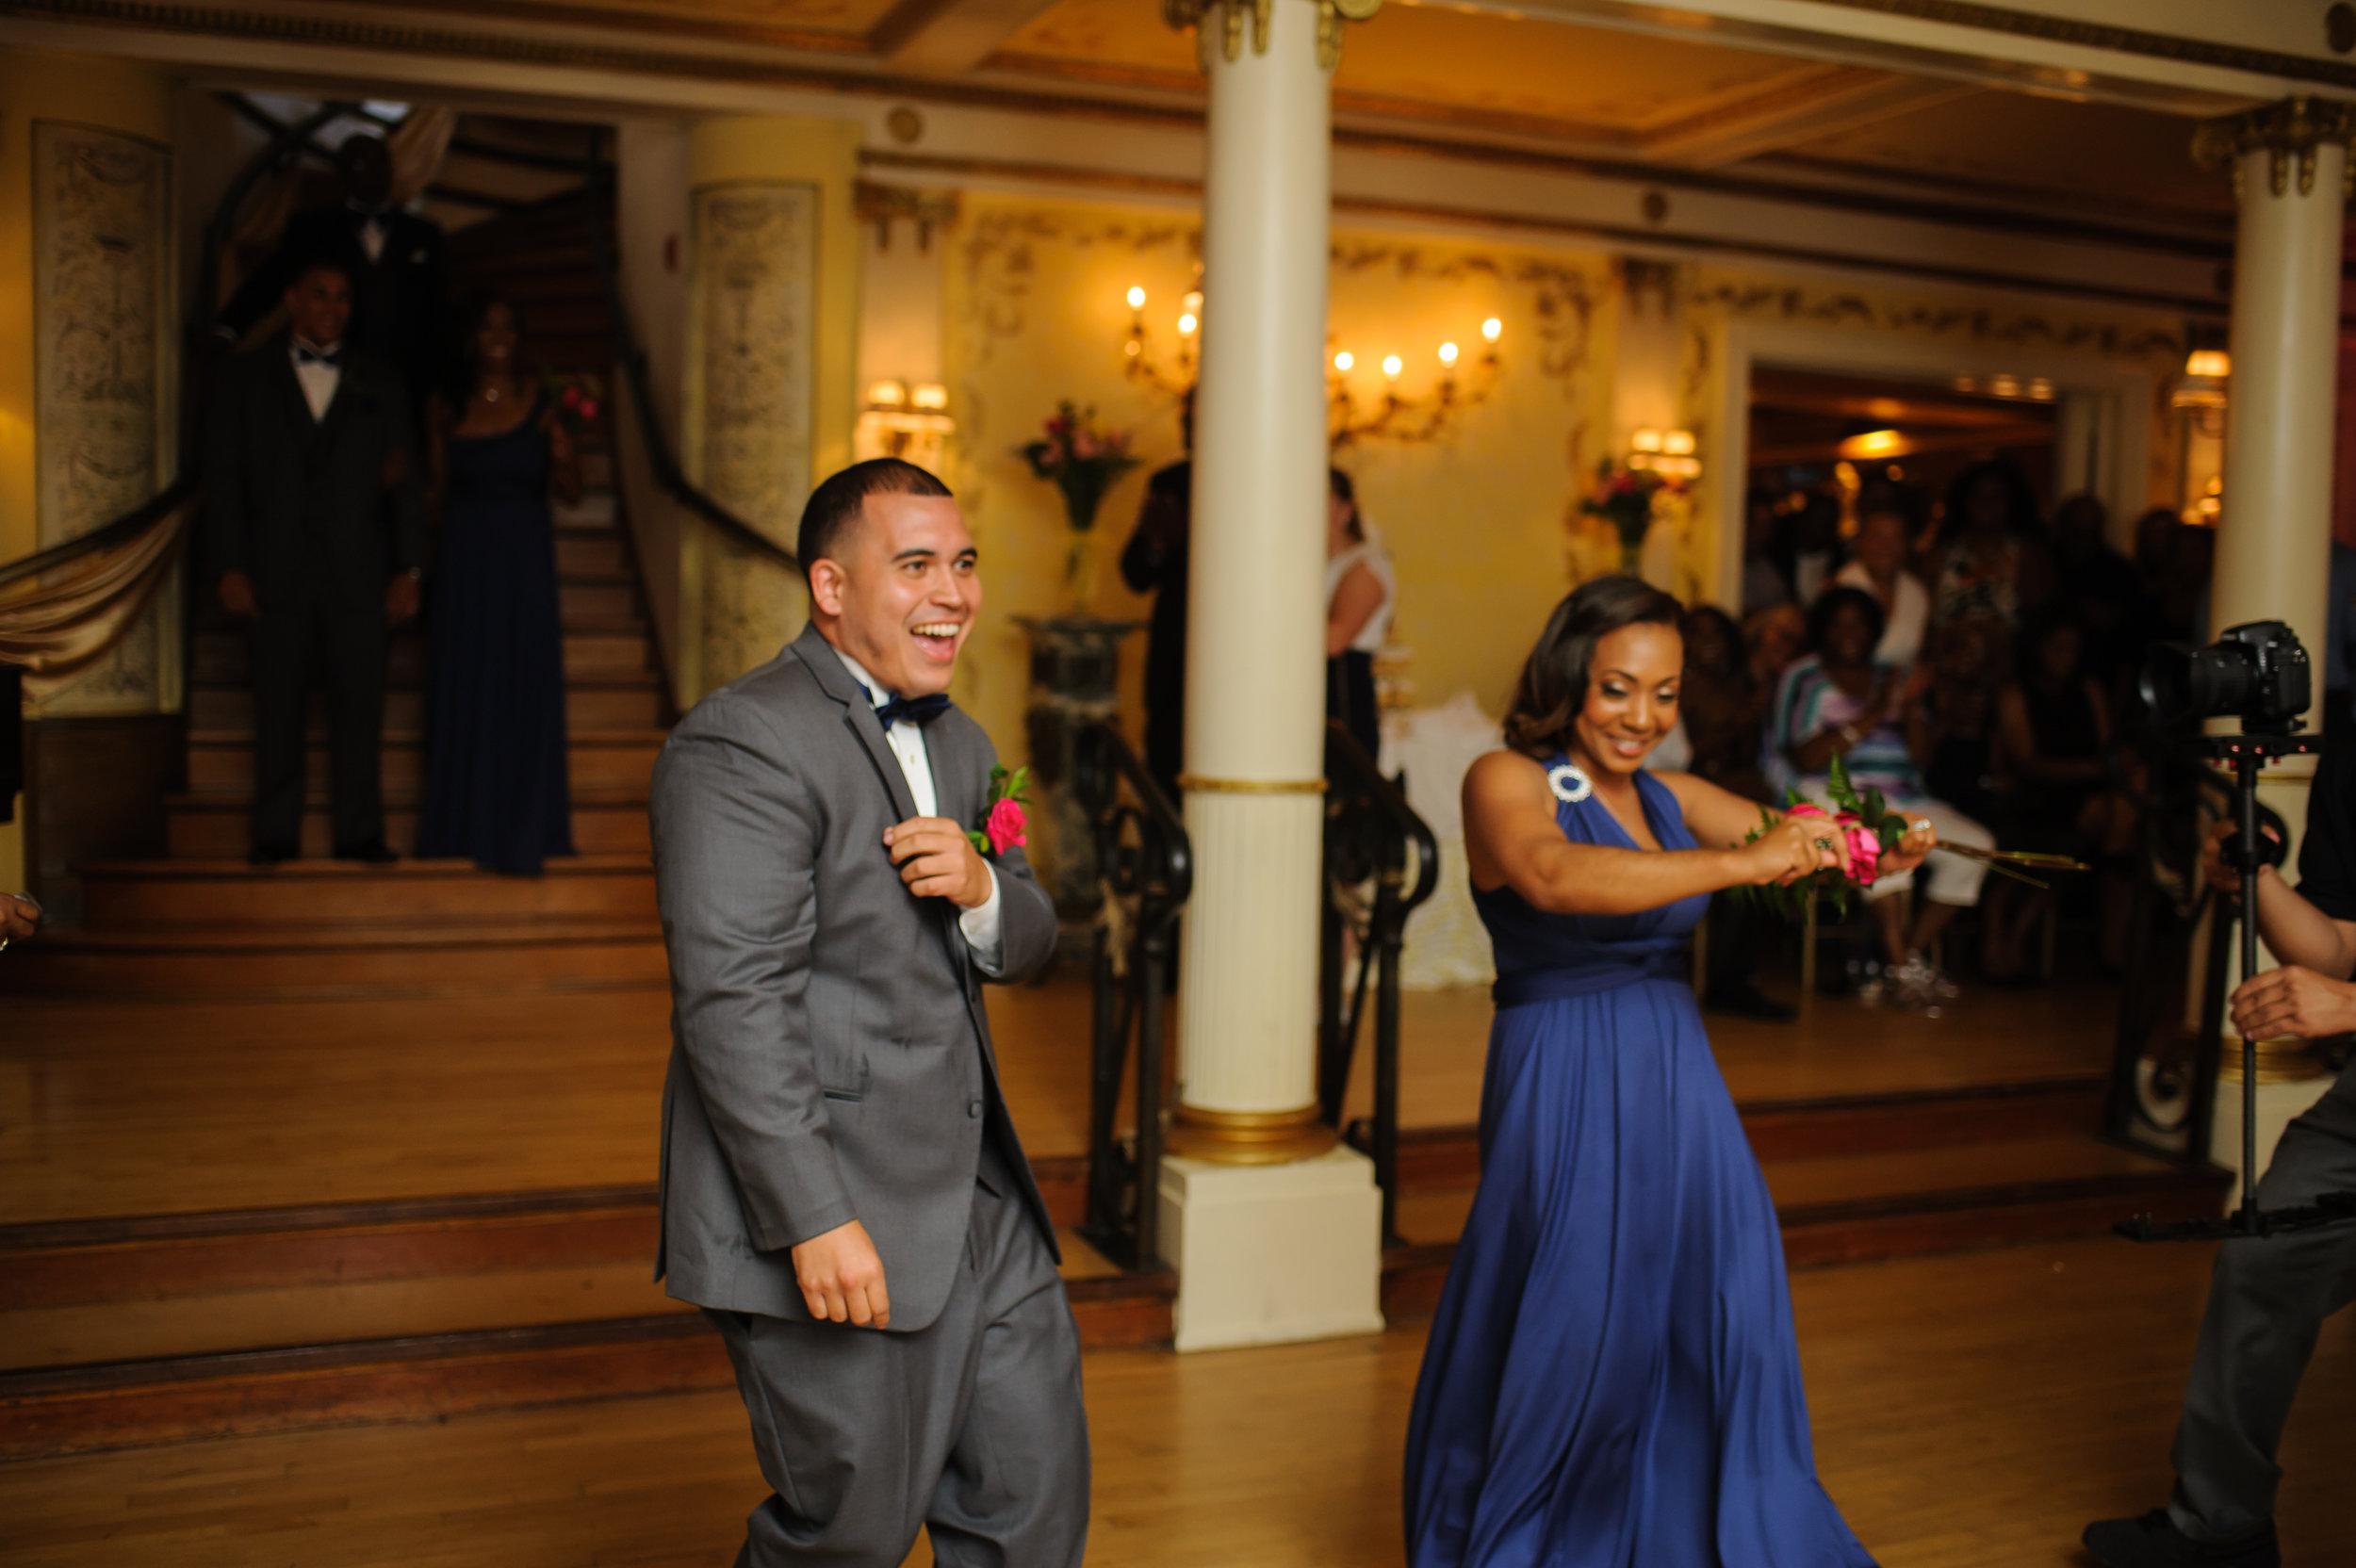 trina-cj-037-grand-island-mansion-sacramento-wedding-photographer-katherine-nicole-photography.JPG